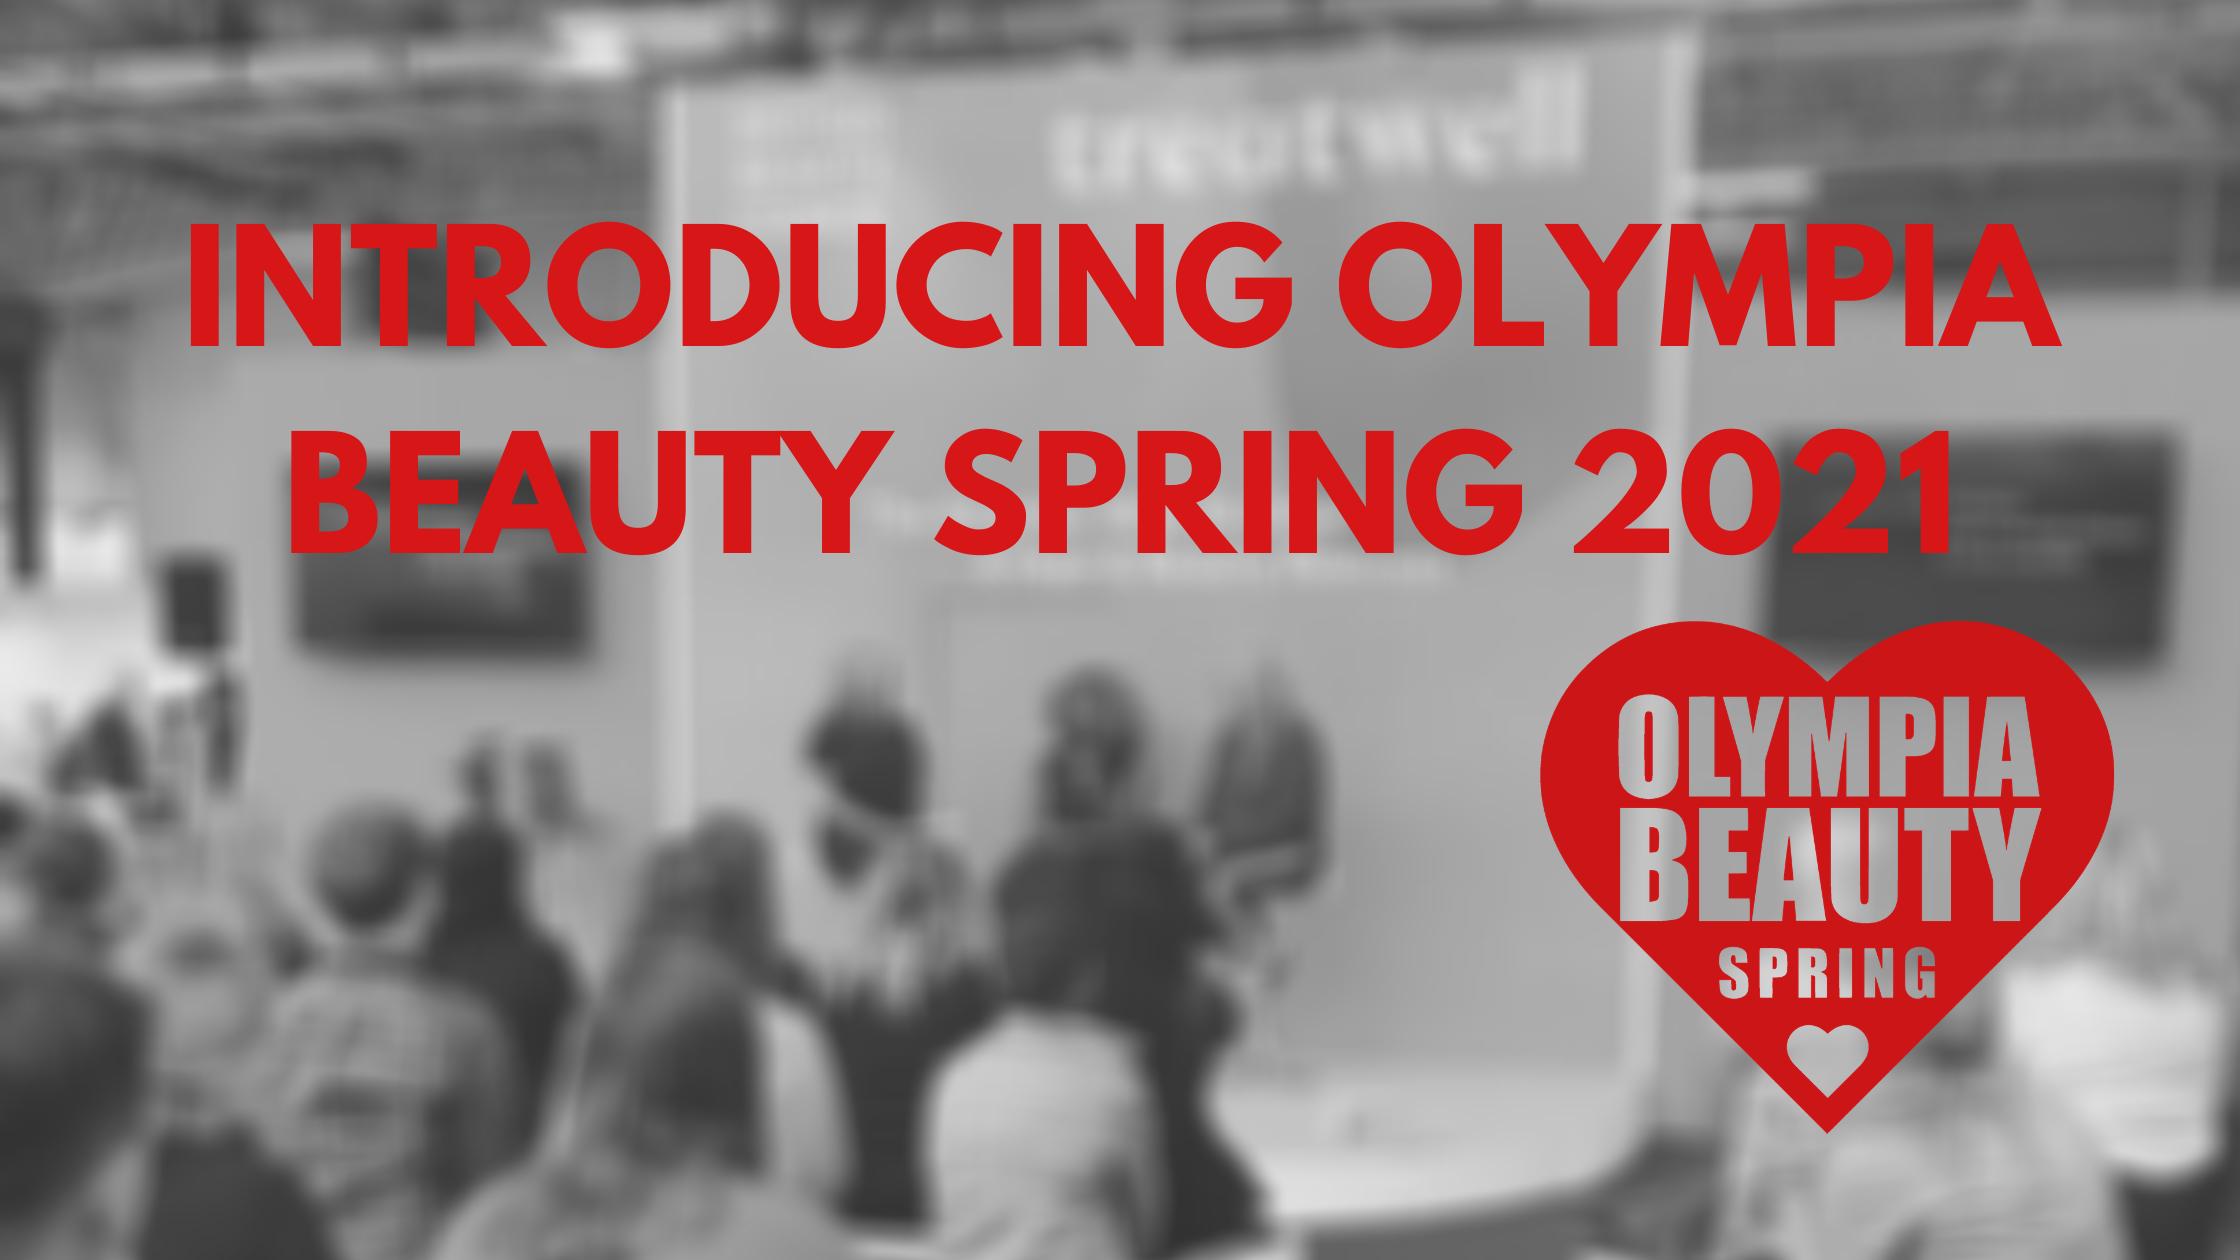 Olympia Beauty Spring 2021